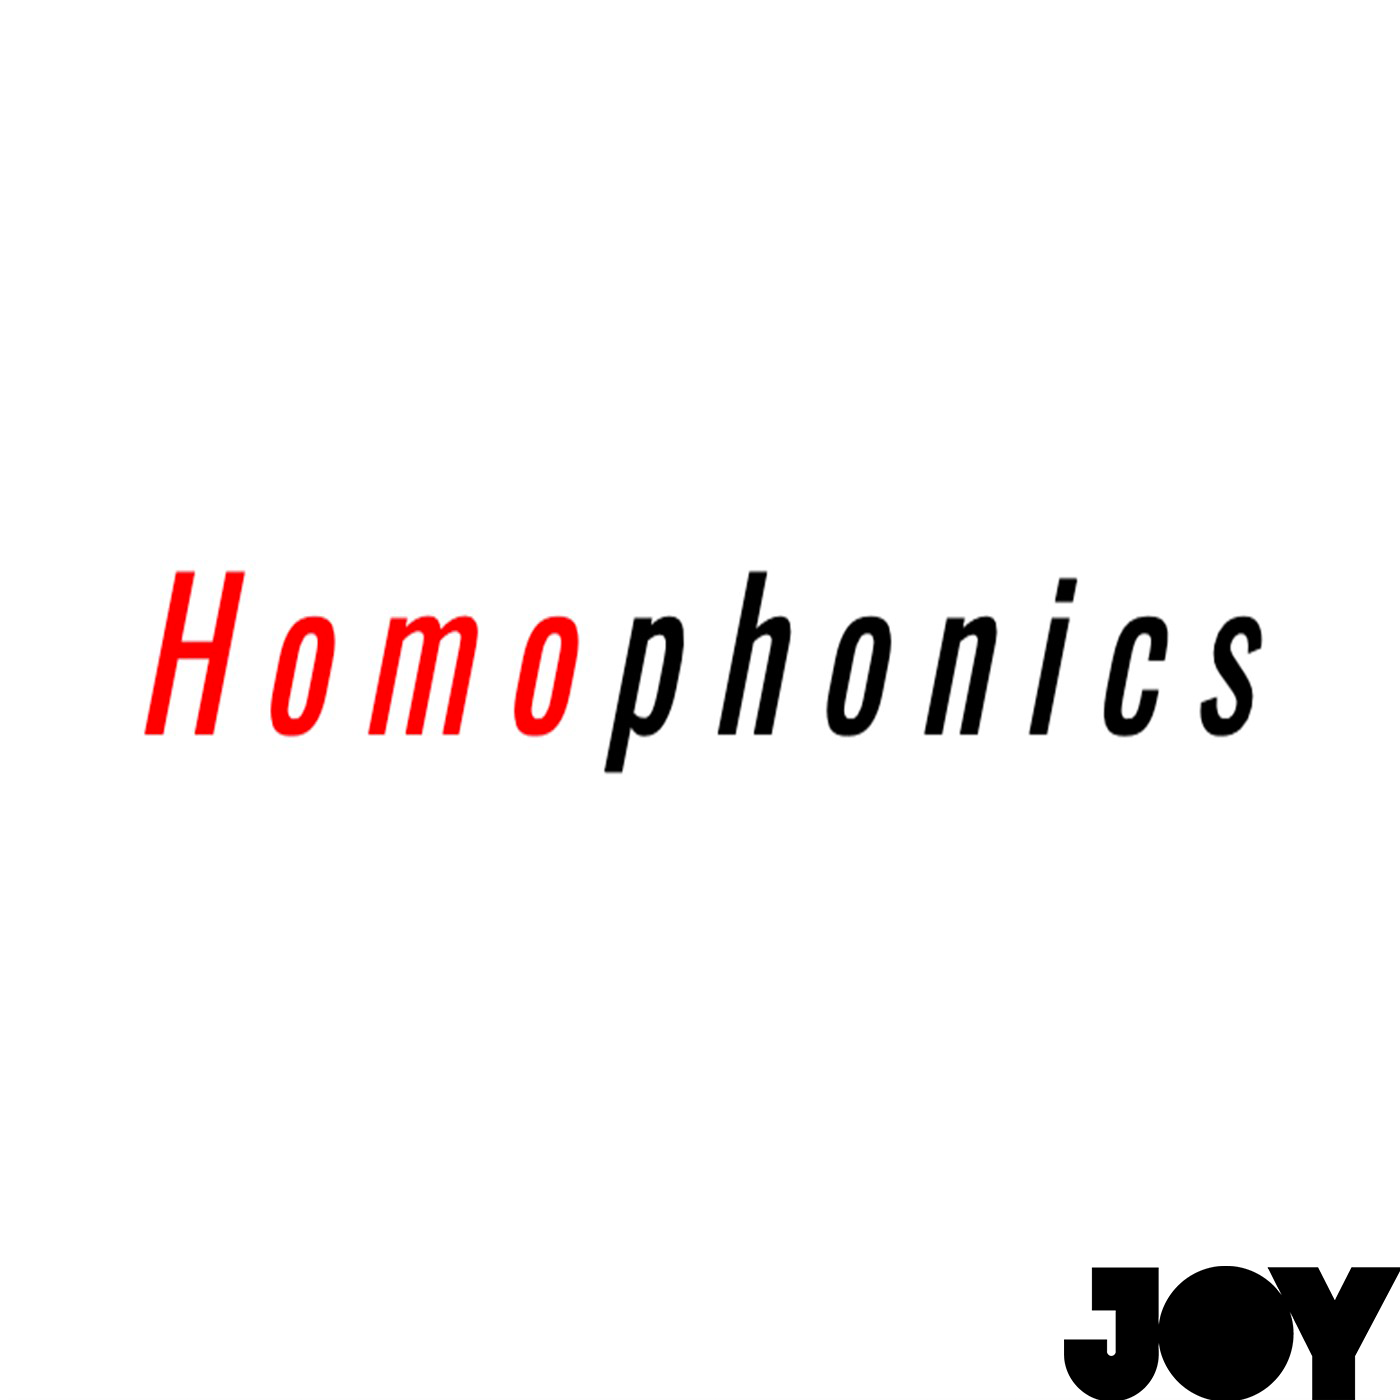 Homophonics